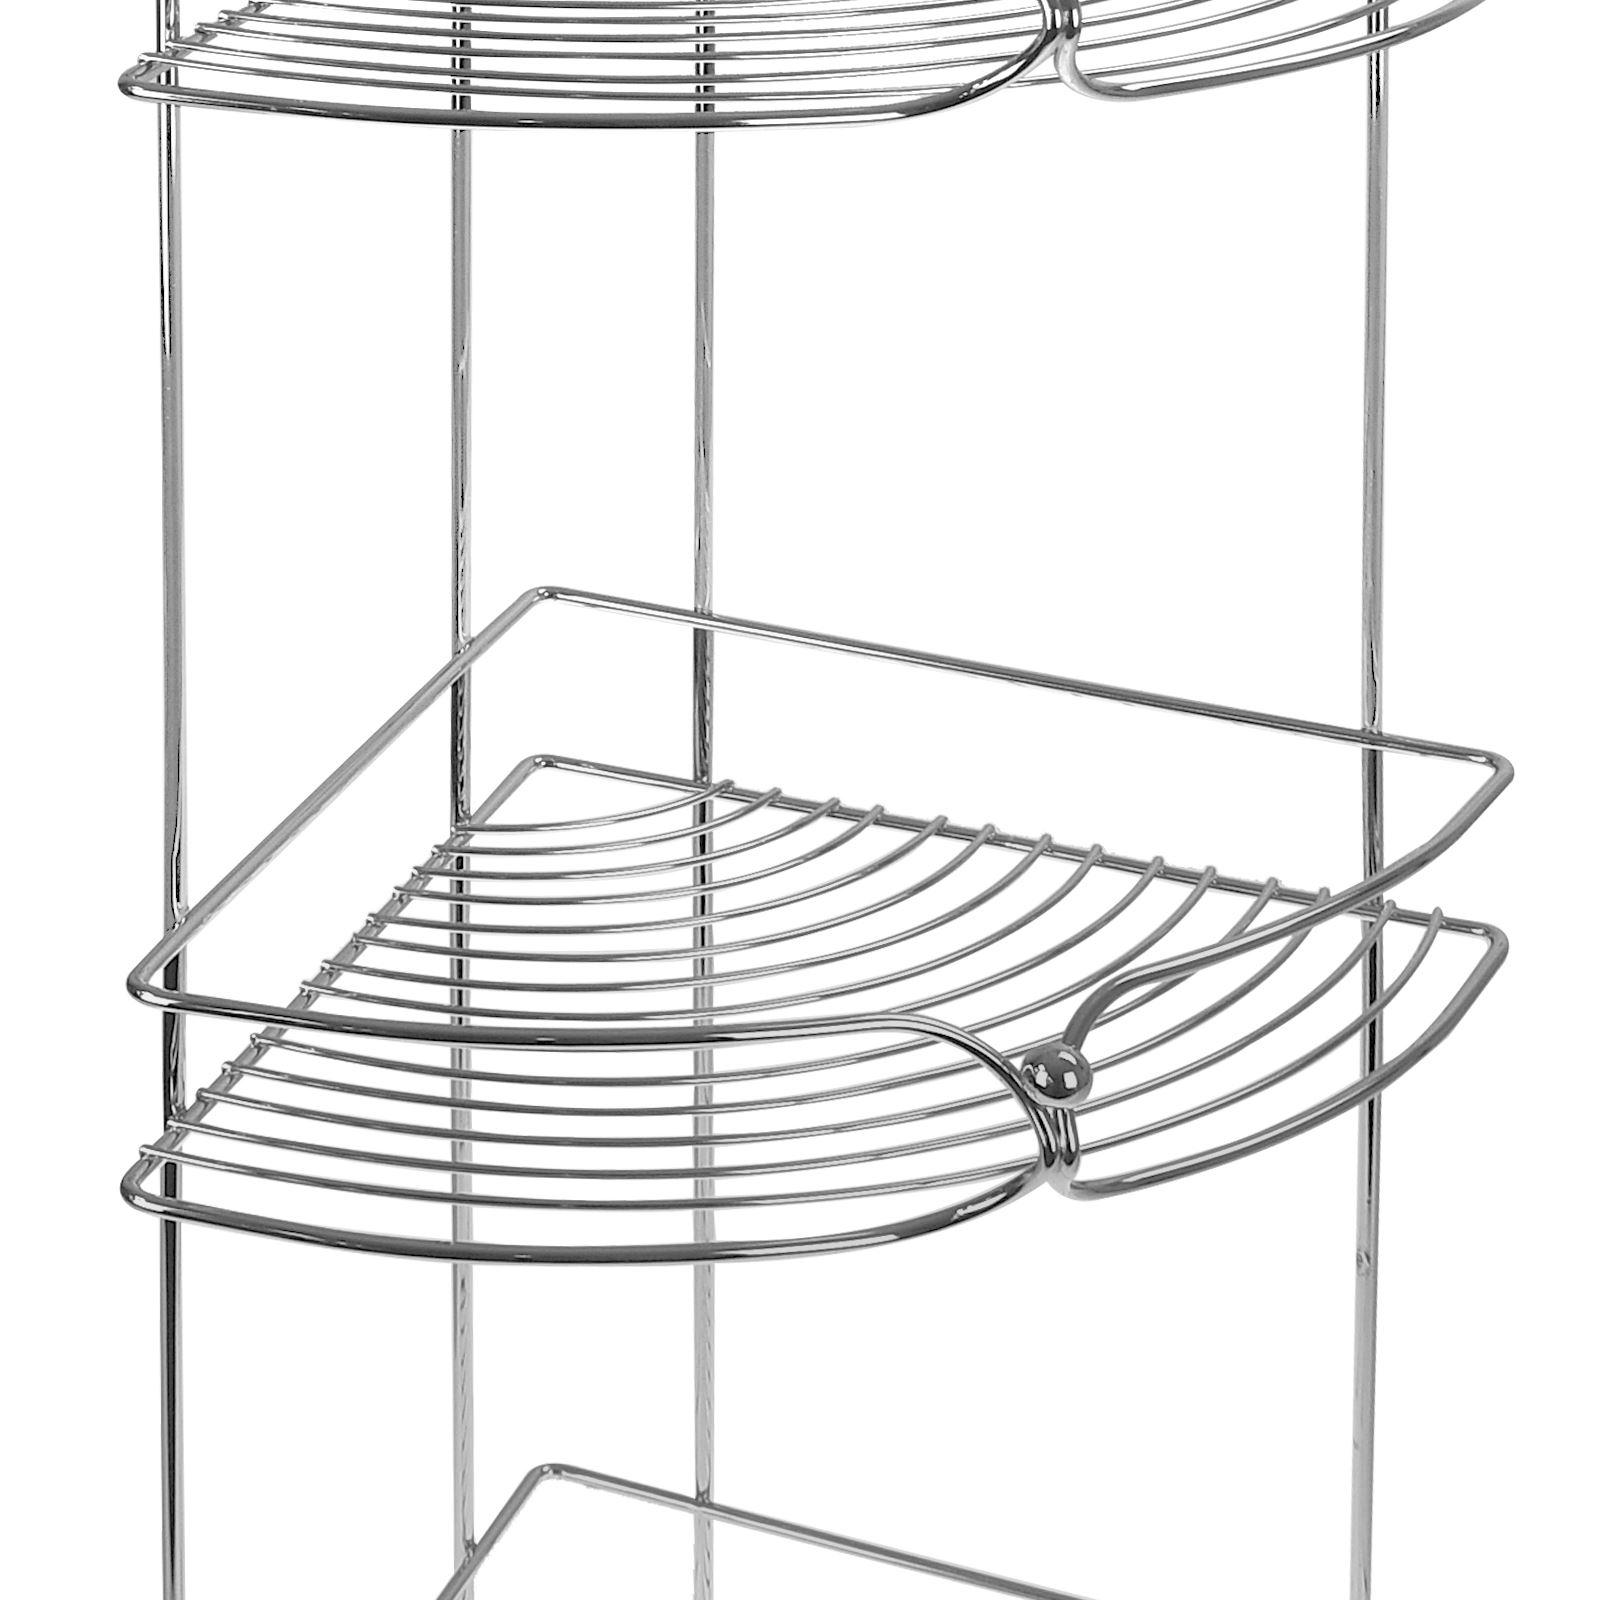 Chrome-Bathroom-Accessory-Shower-Caddy-Corner-Rack-Storage-Trolley-Roll-Holder thumbnail 8